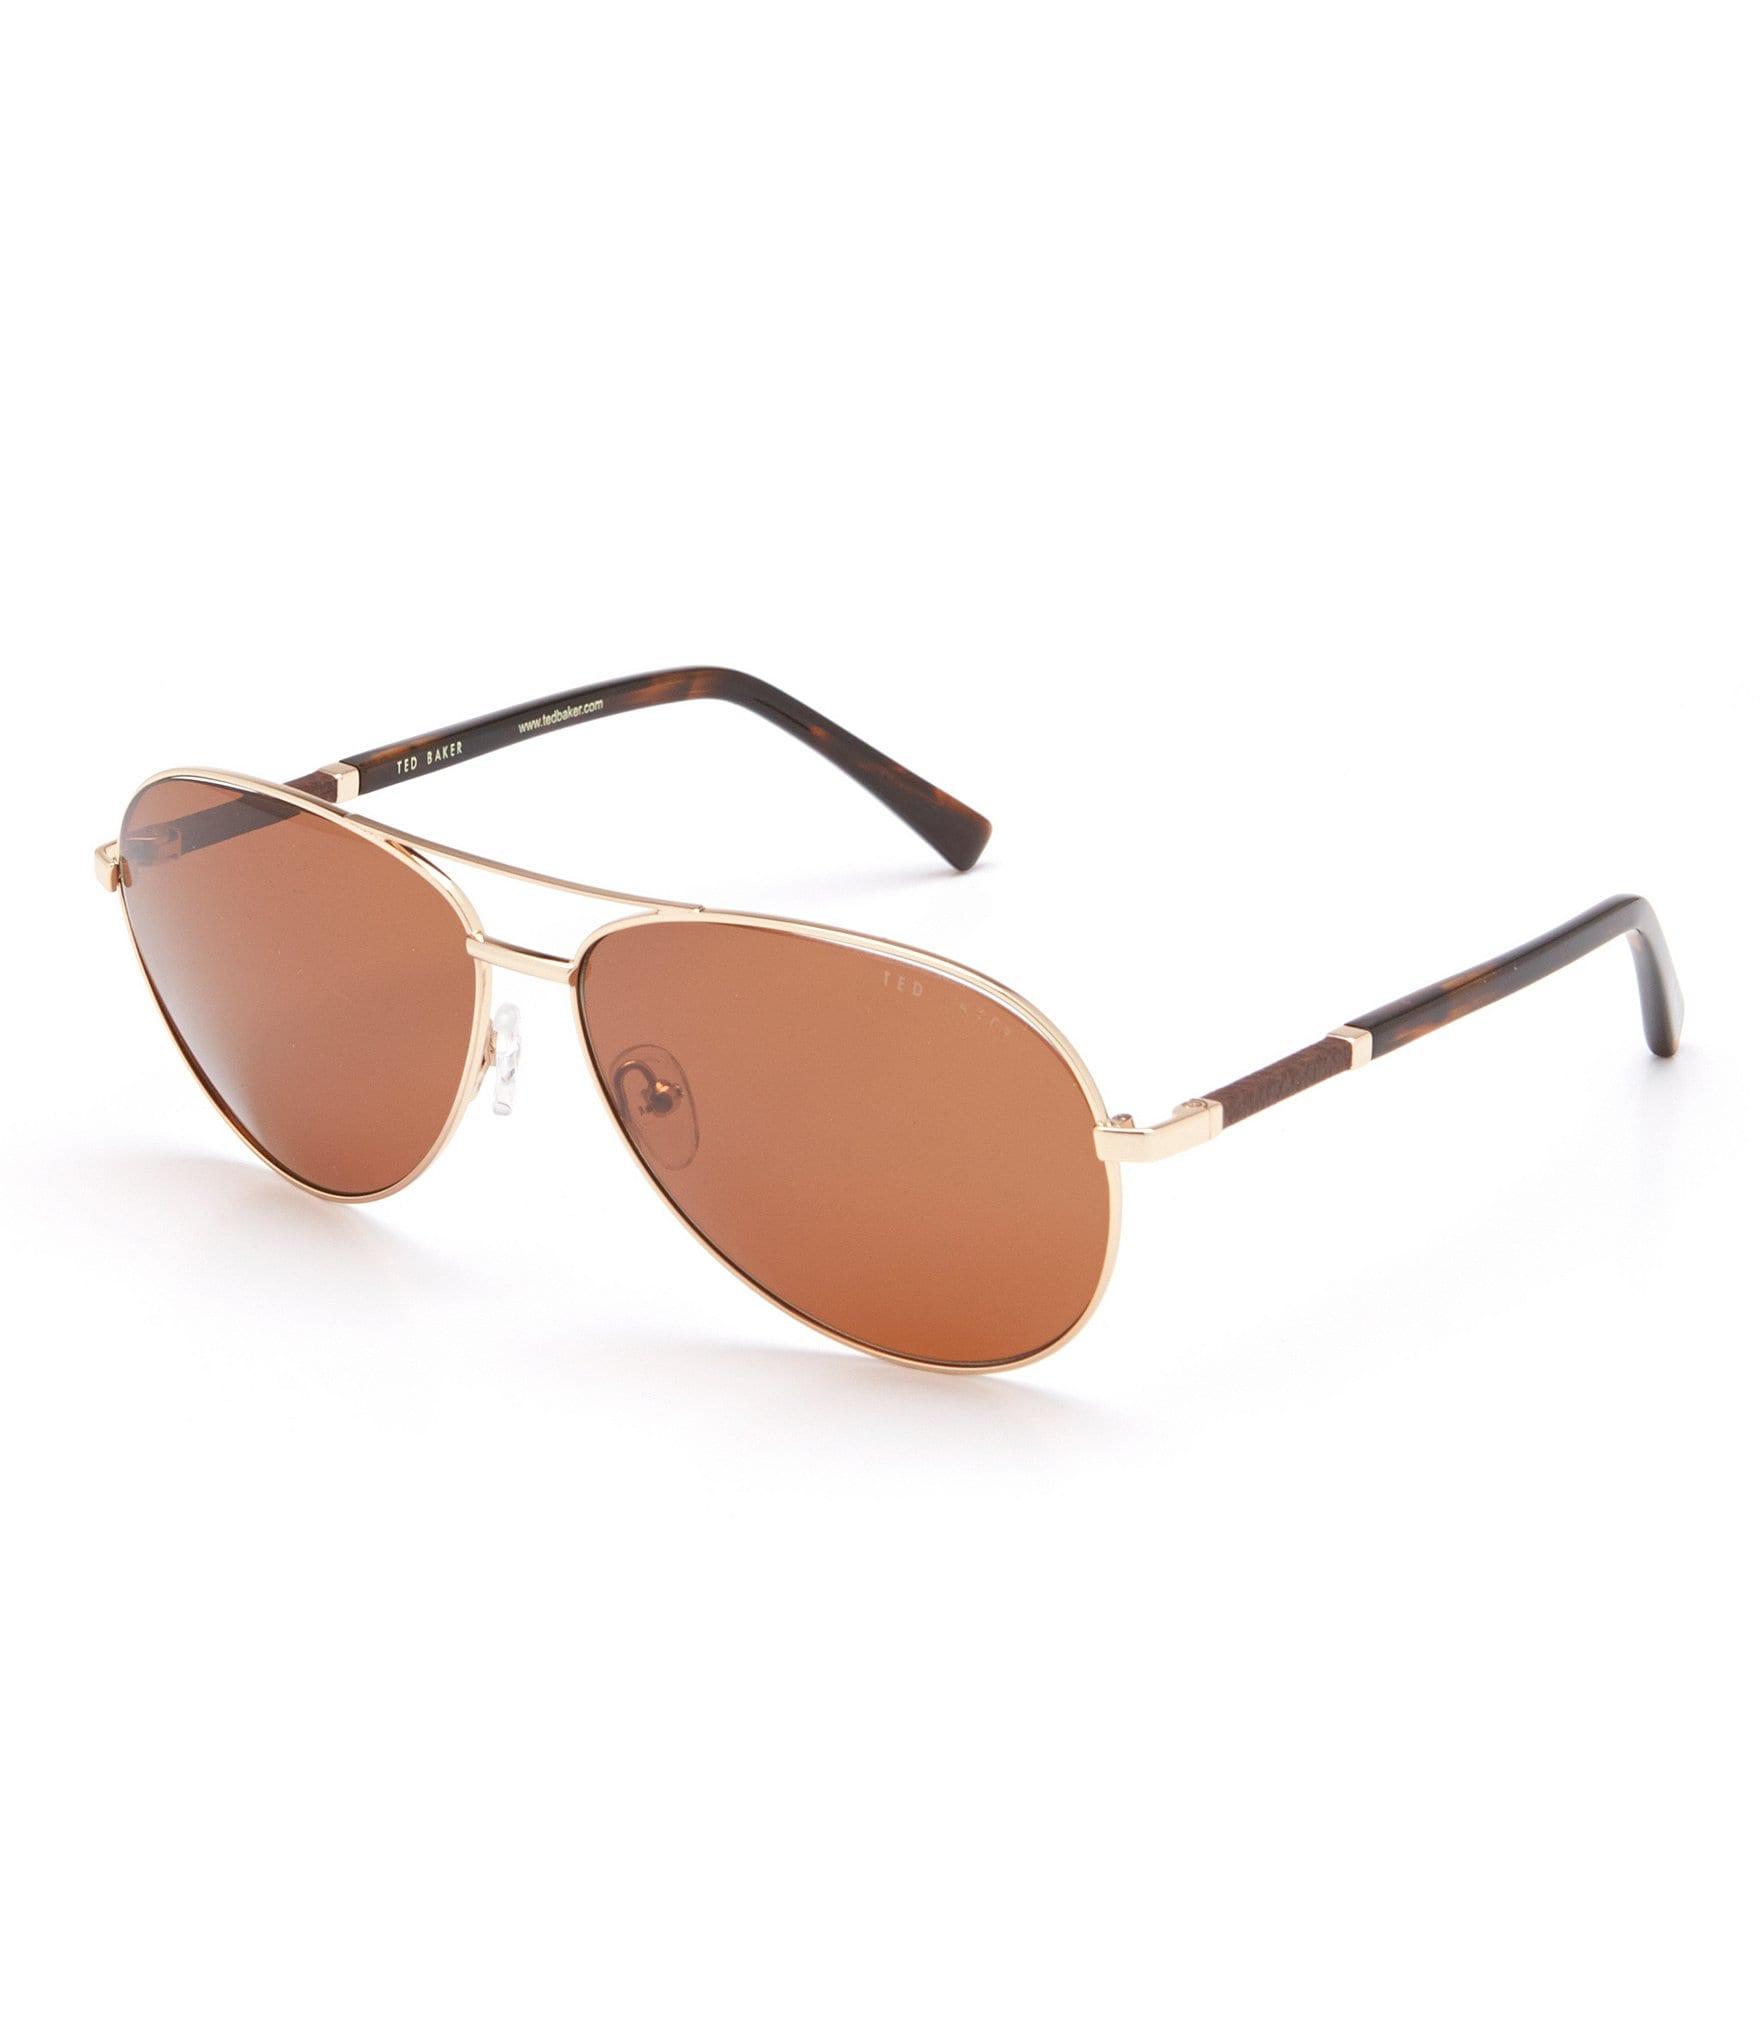 5fd7cff16fa Luenx Aviator Sunglasses Polarized Review